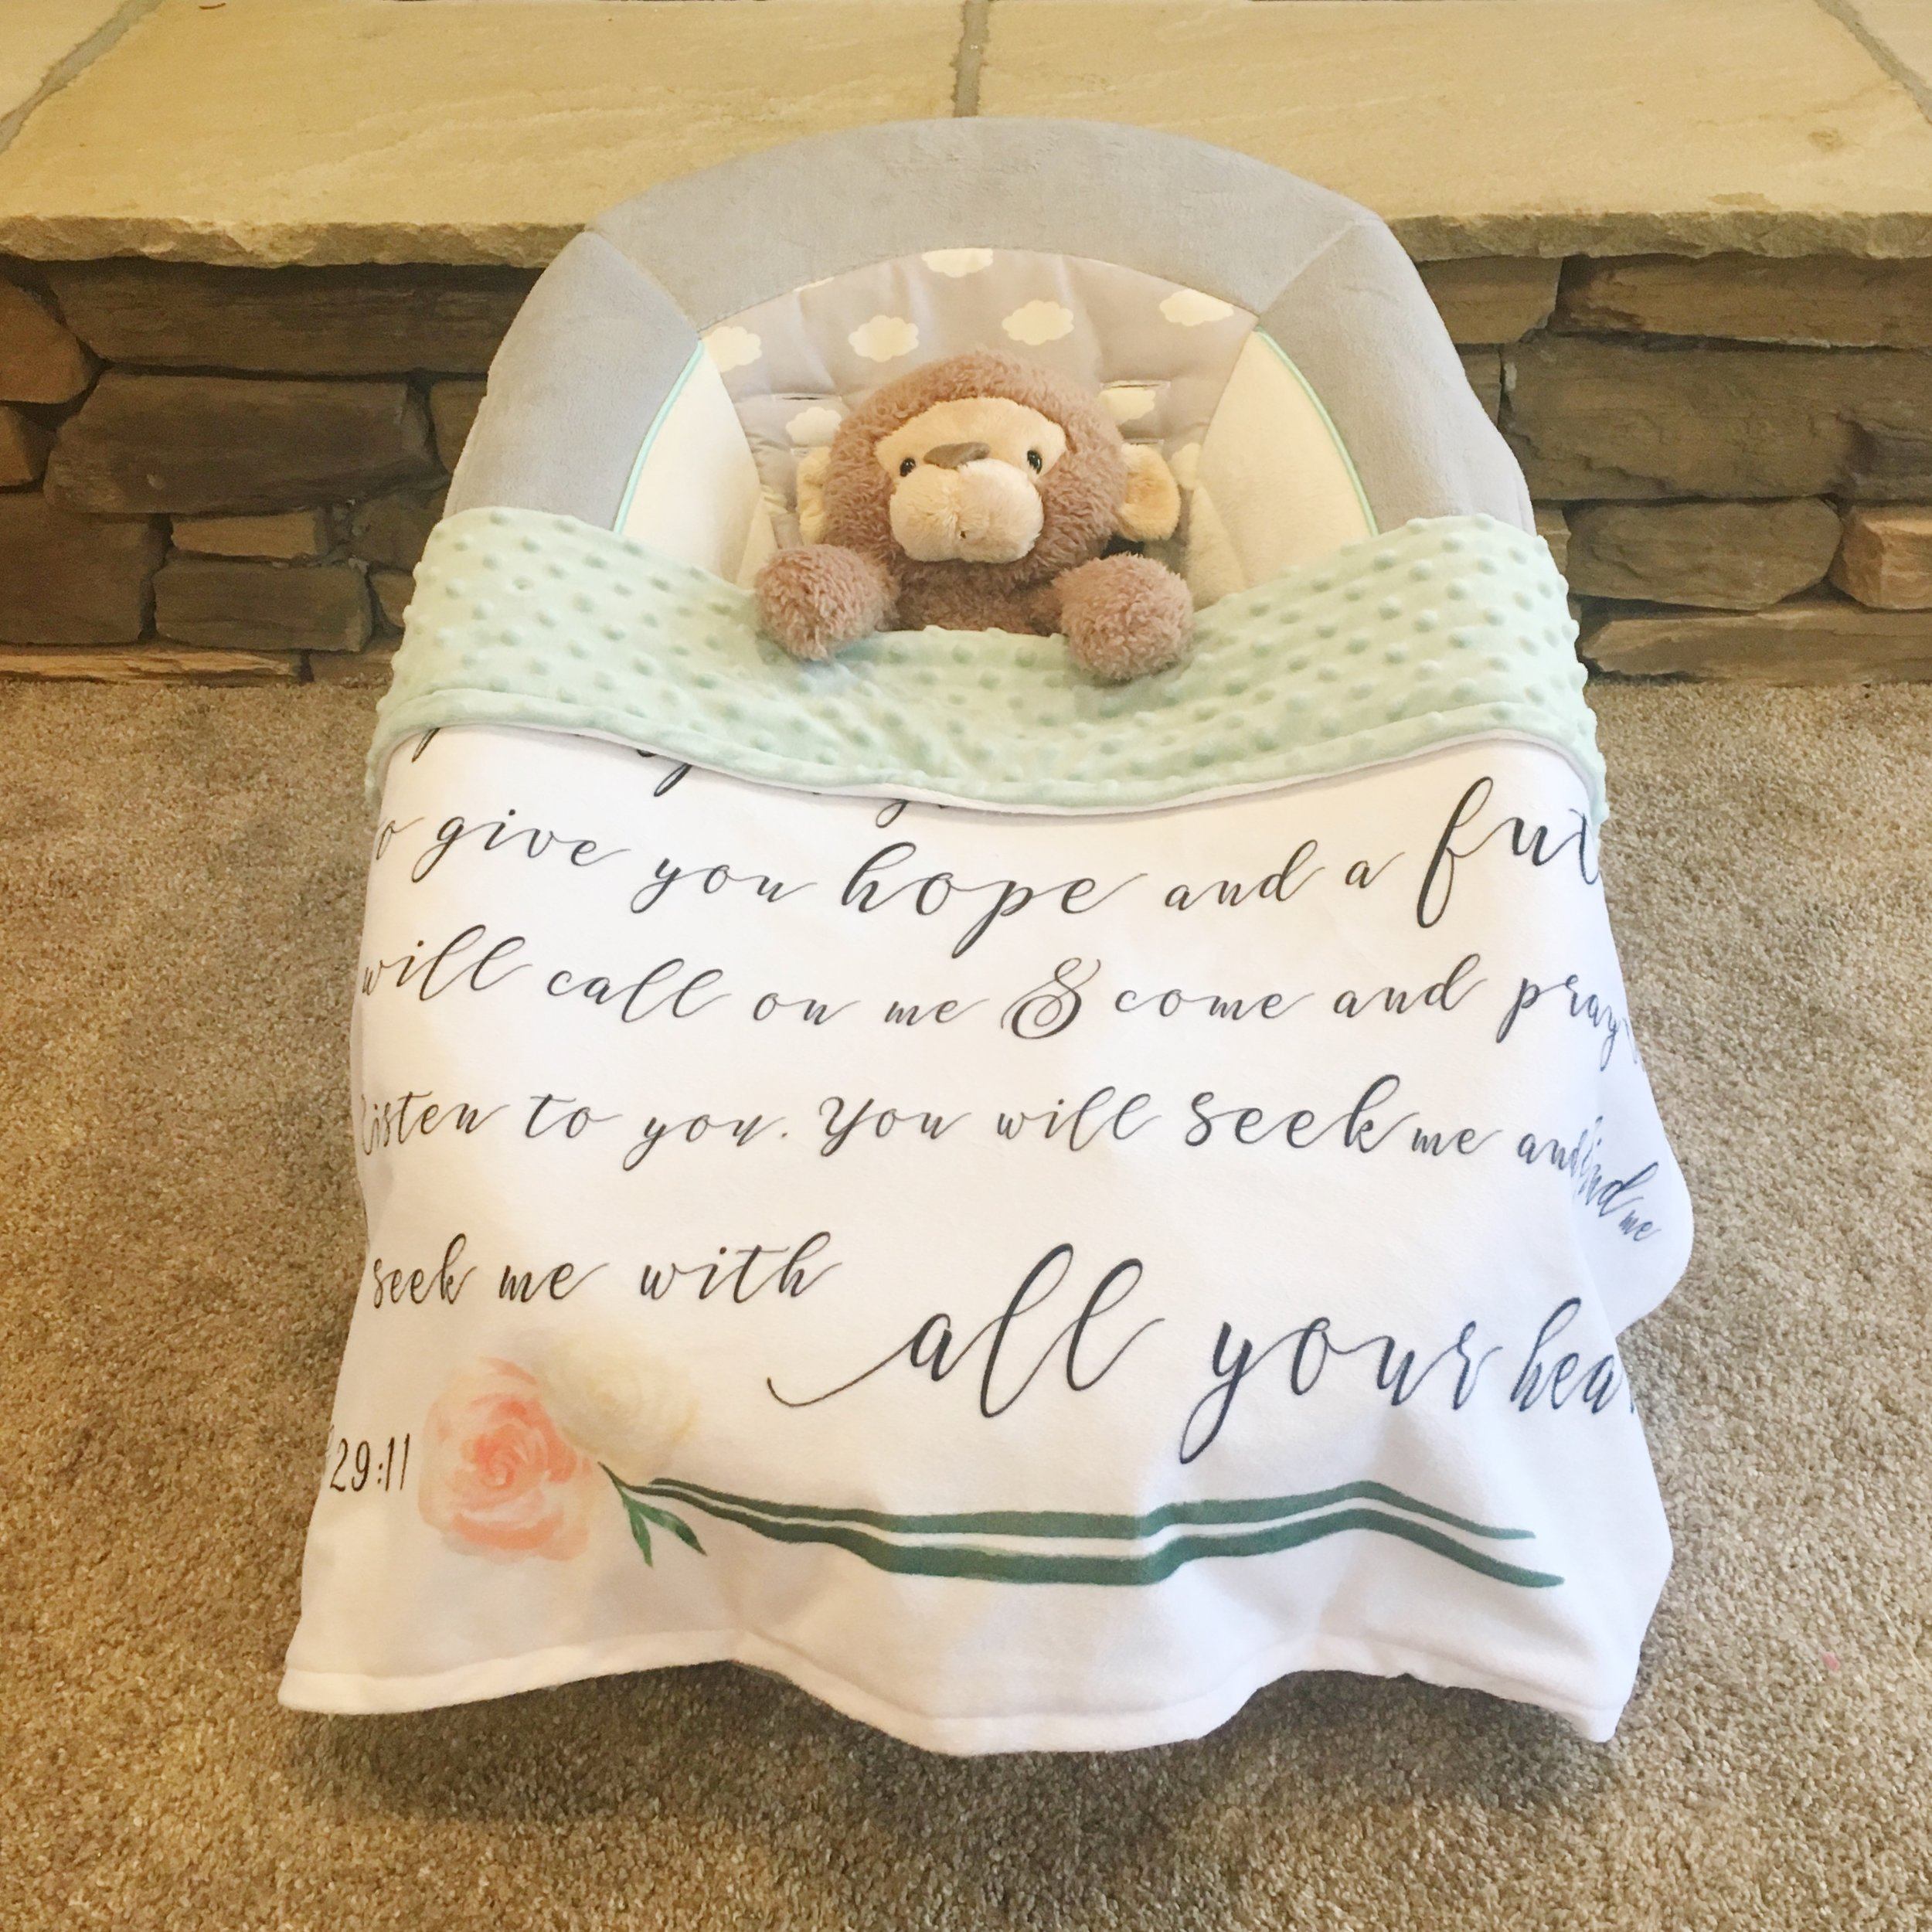 Central PA, Baby Blanket, Hand lettered, JesSmith Designs, Invitations, custom-04-22 10.01.13.jpg